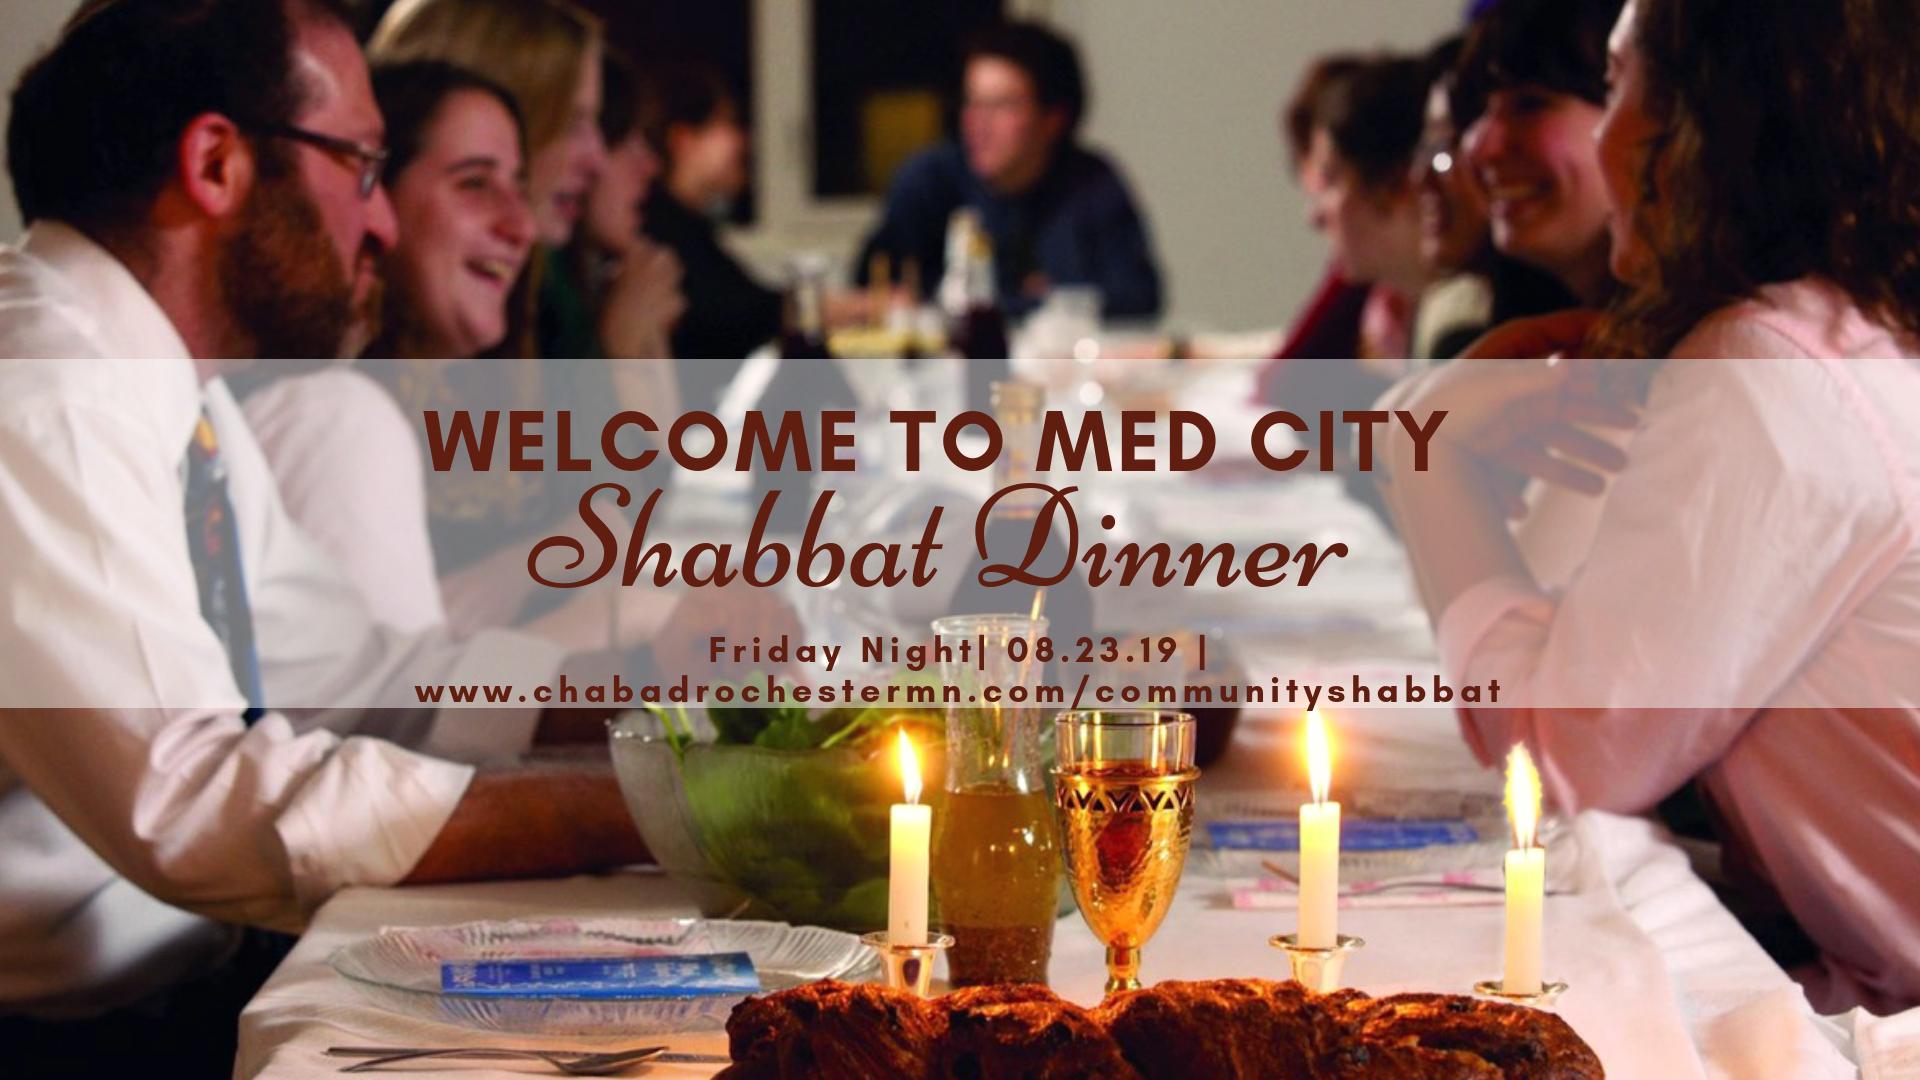 medcityshabbat_2019_FB_Event.png